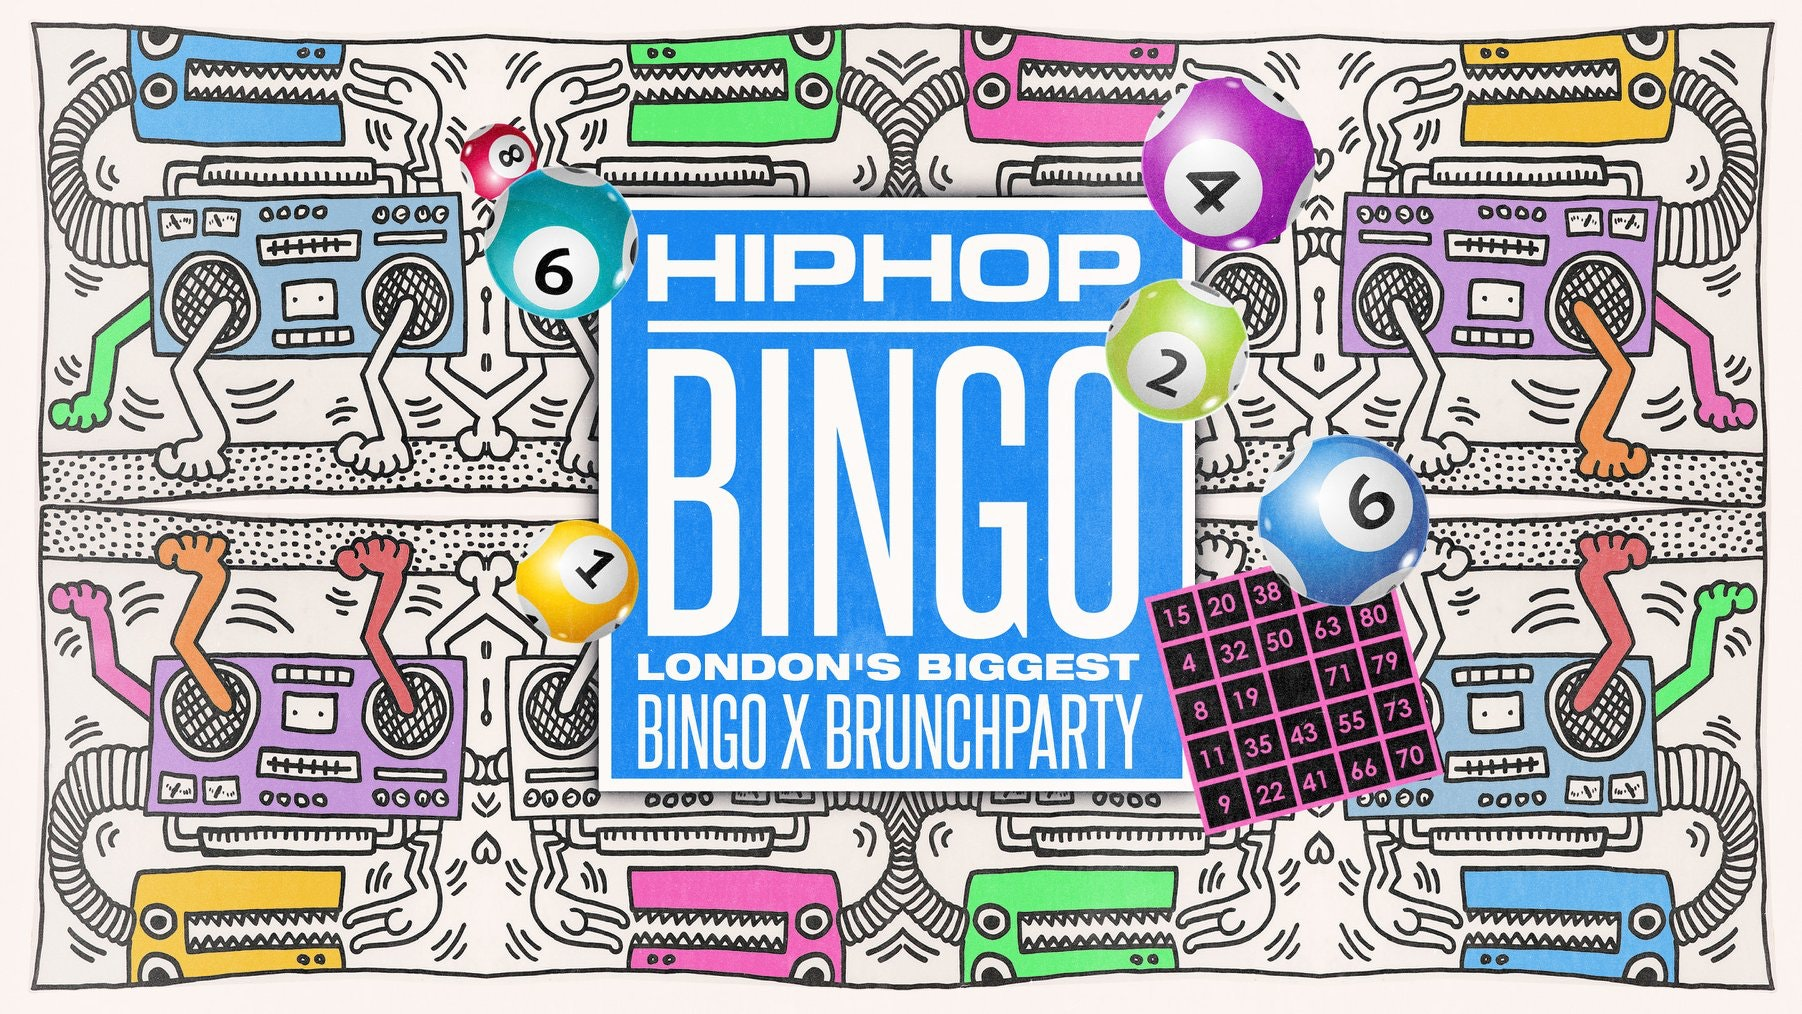 The London HipHop Bingo x Brunch 🎱 April 26th | Live at Dabbers 🎉